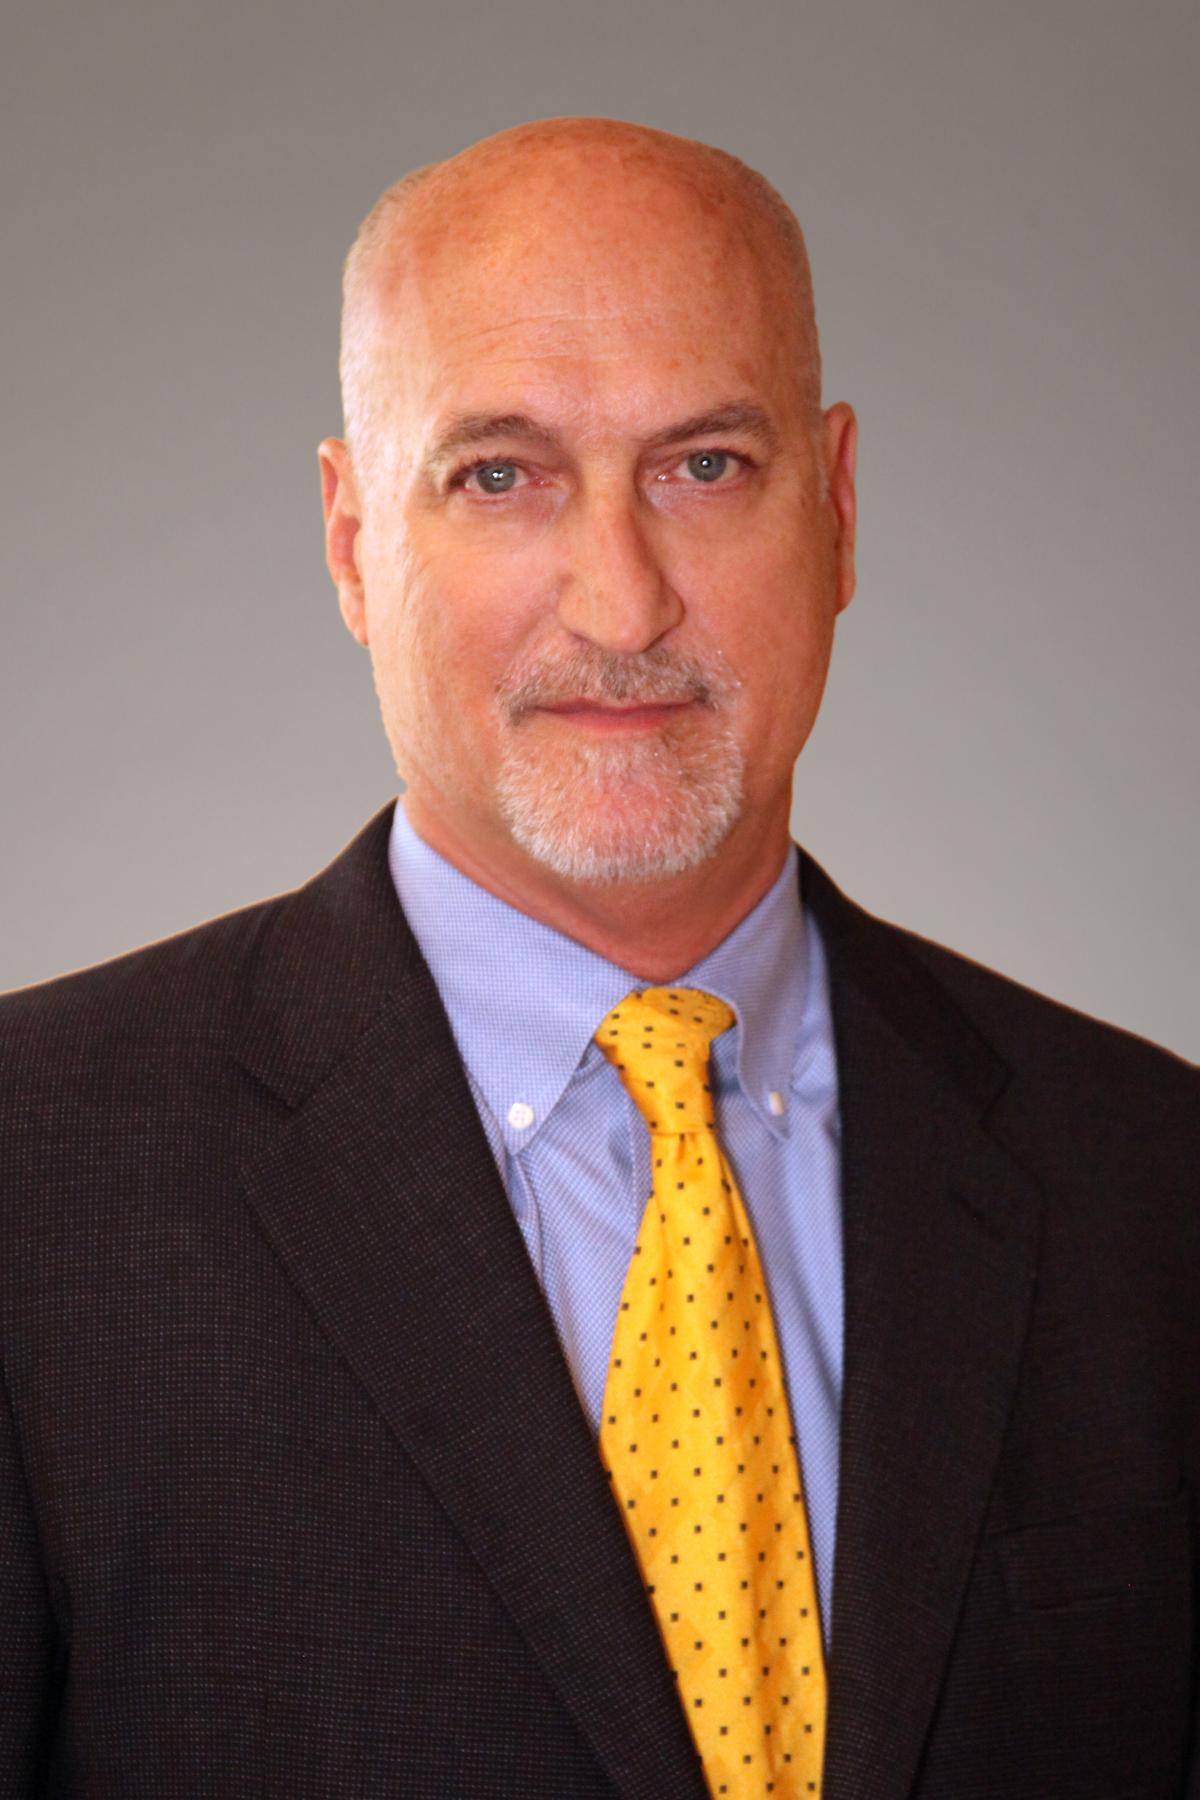 Malpractice Specialist Scott R. McMillen